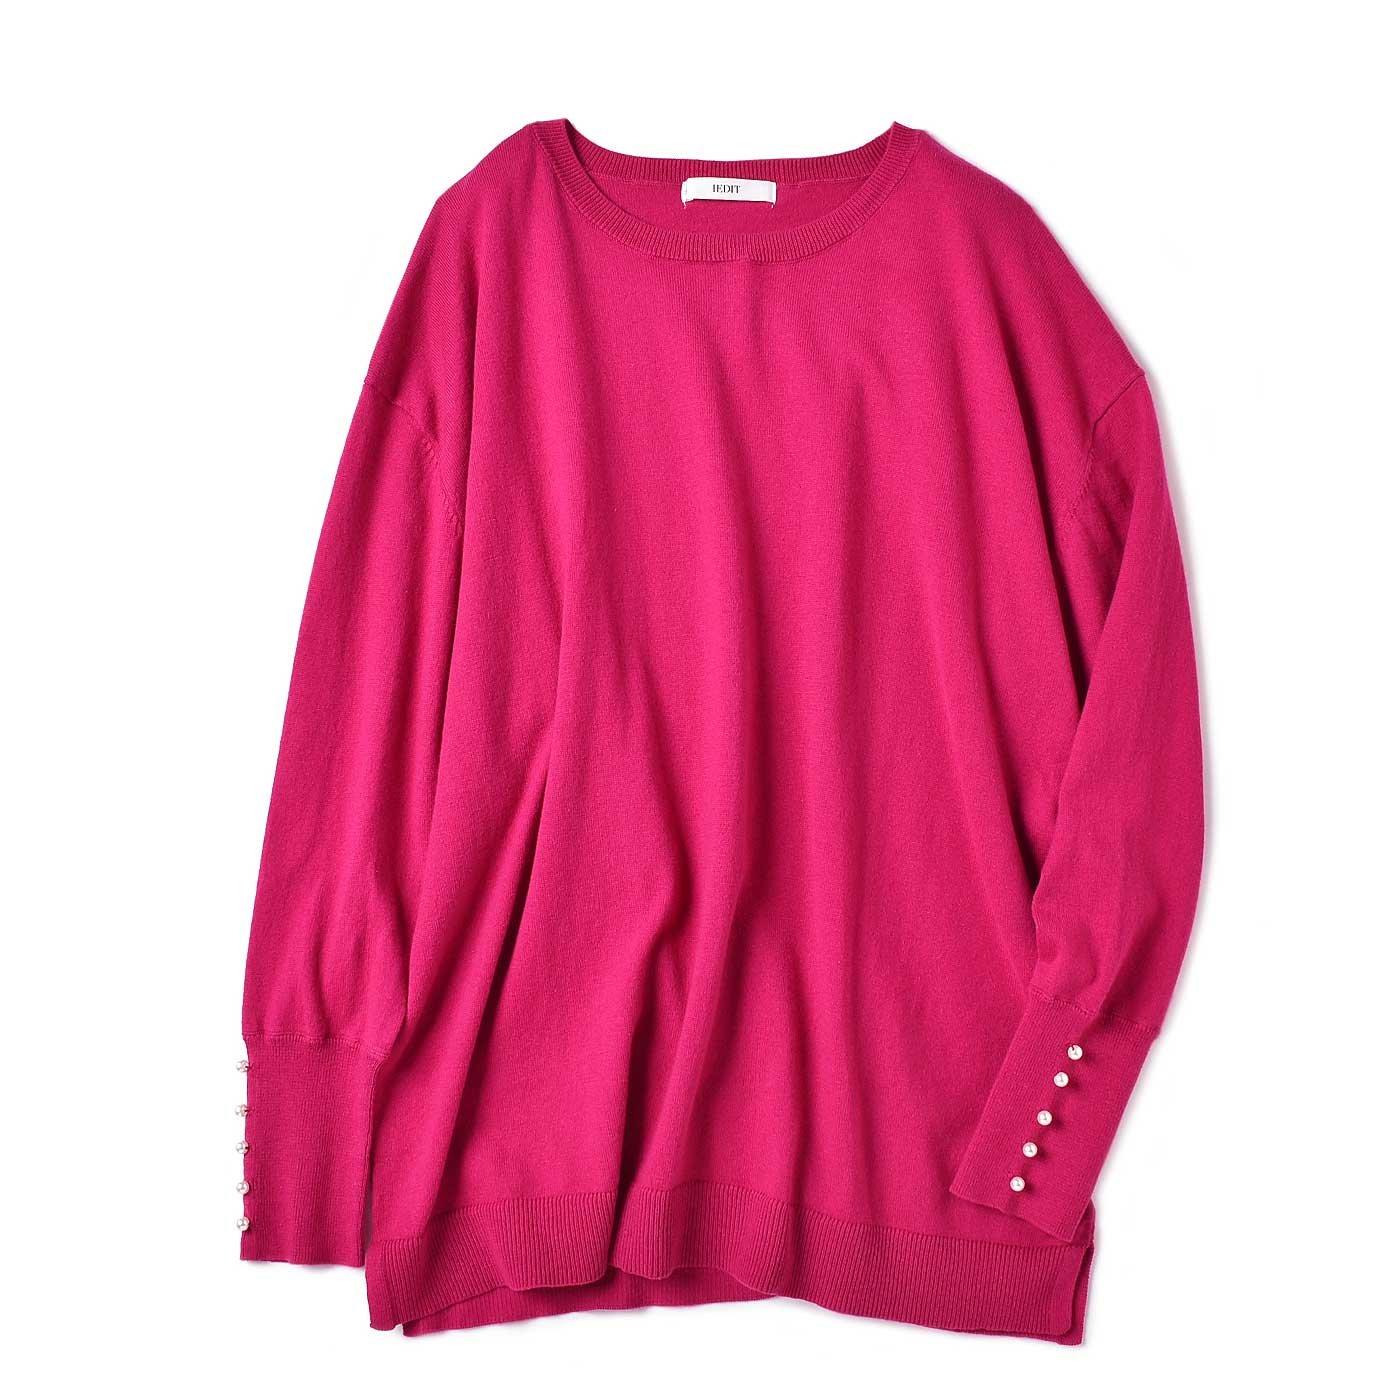 IEDIT[イディット] スクエアシルエットでゆる着映え 袖口パールのコットンニットトップス〈ピンク〉